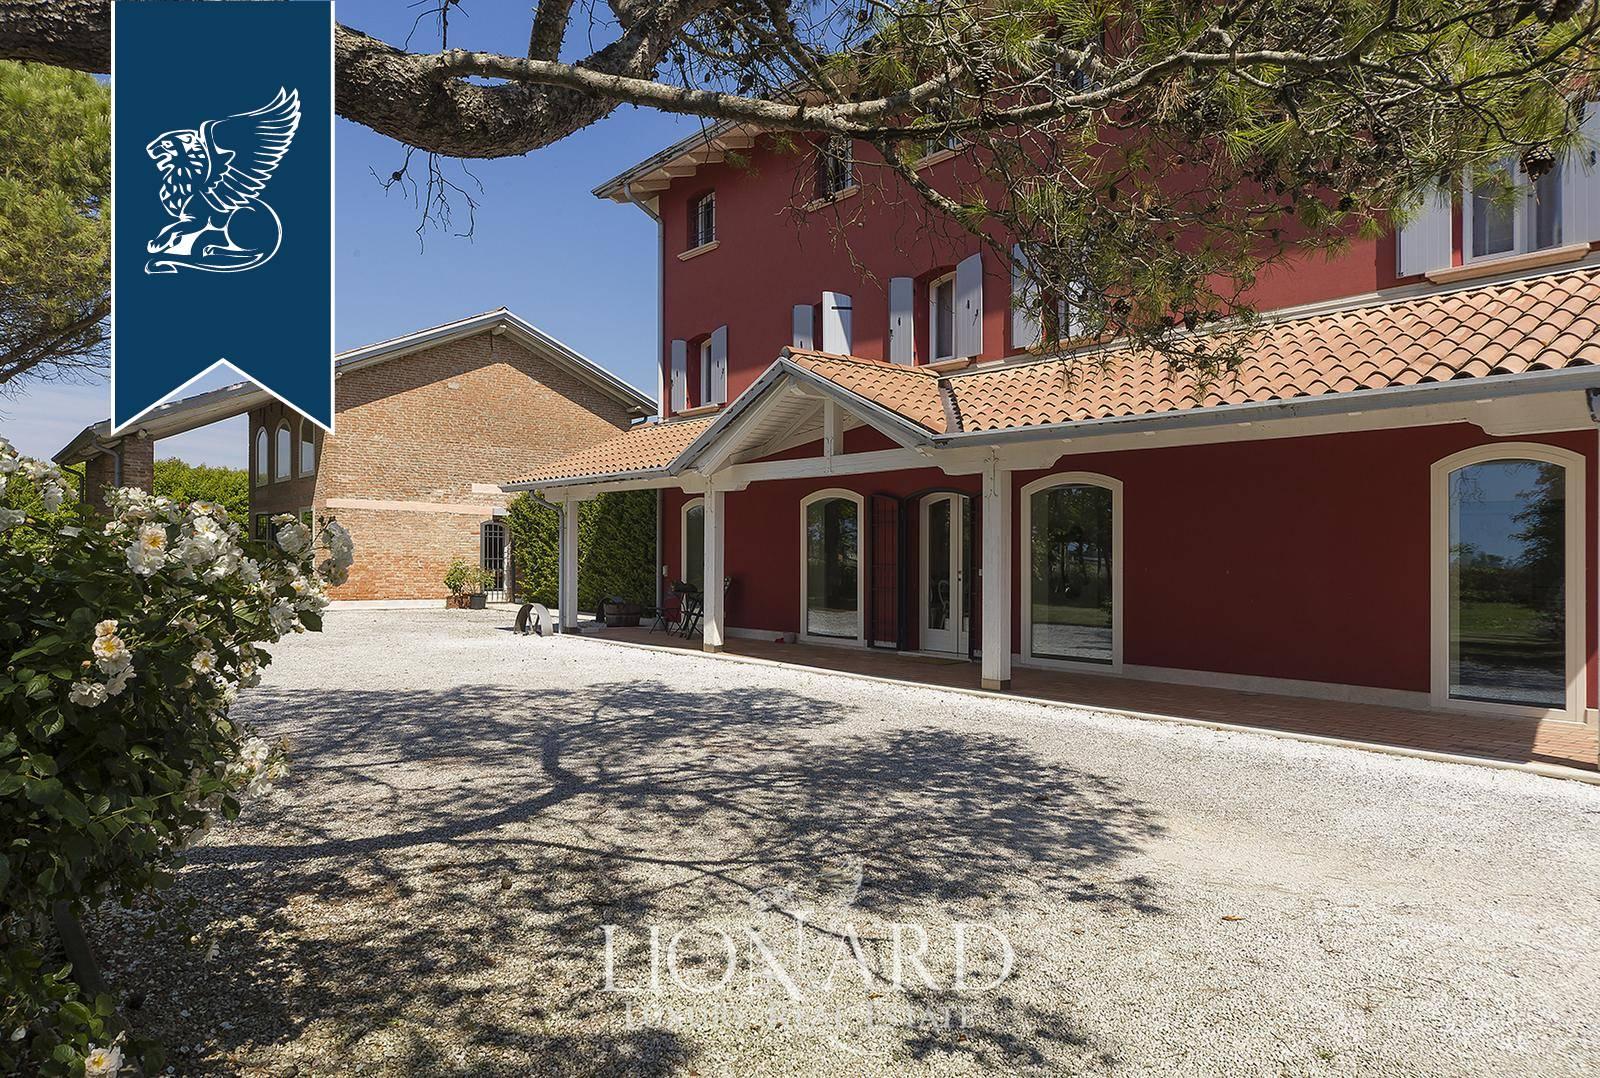 Rustico in Vendita a San Dona' Di Piave: 0 locali, 300 mq - Foto 3